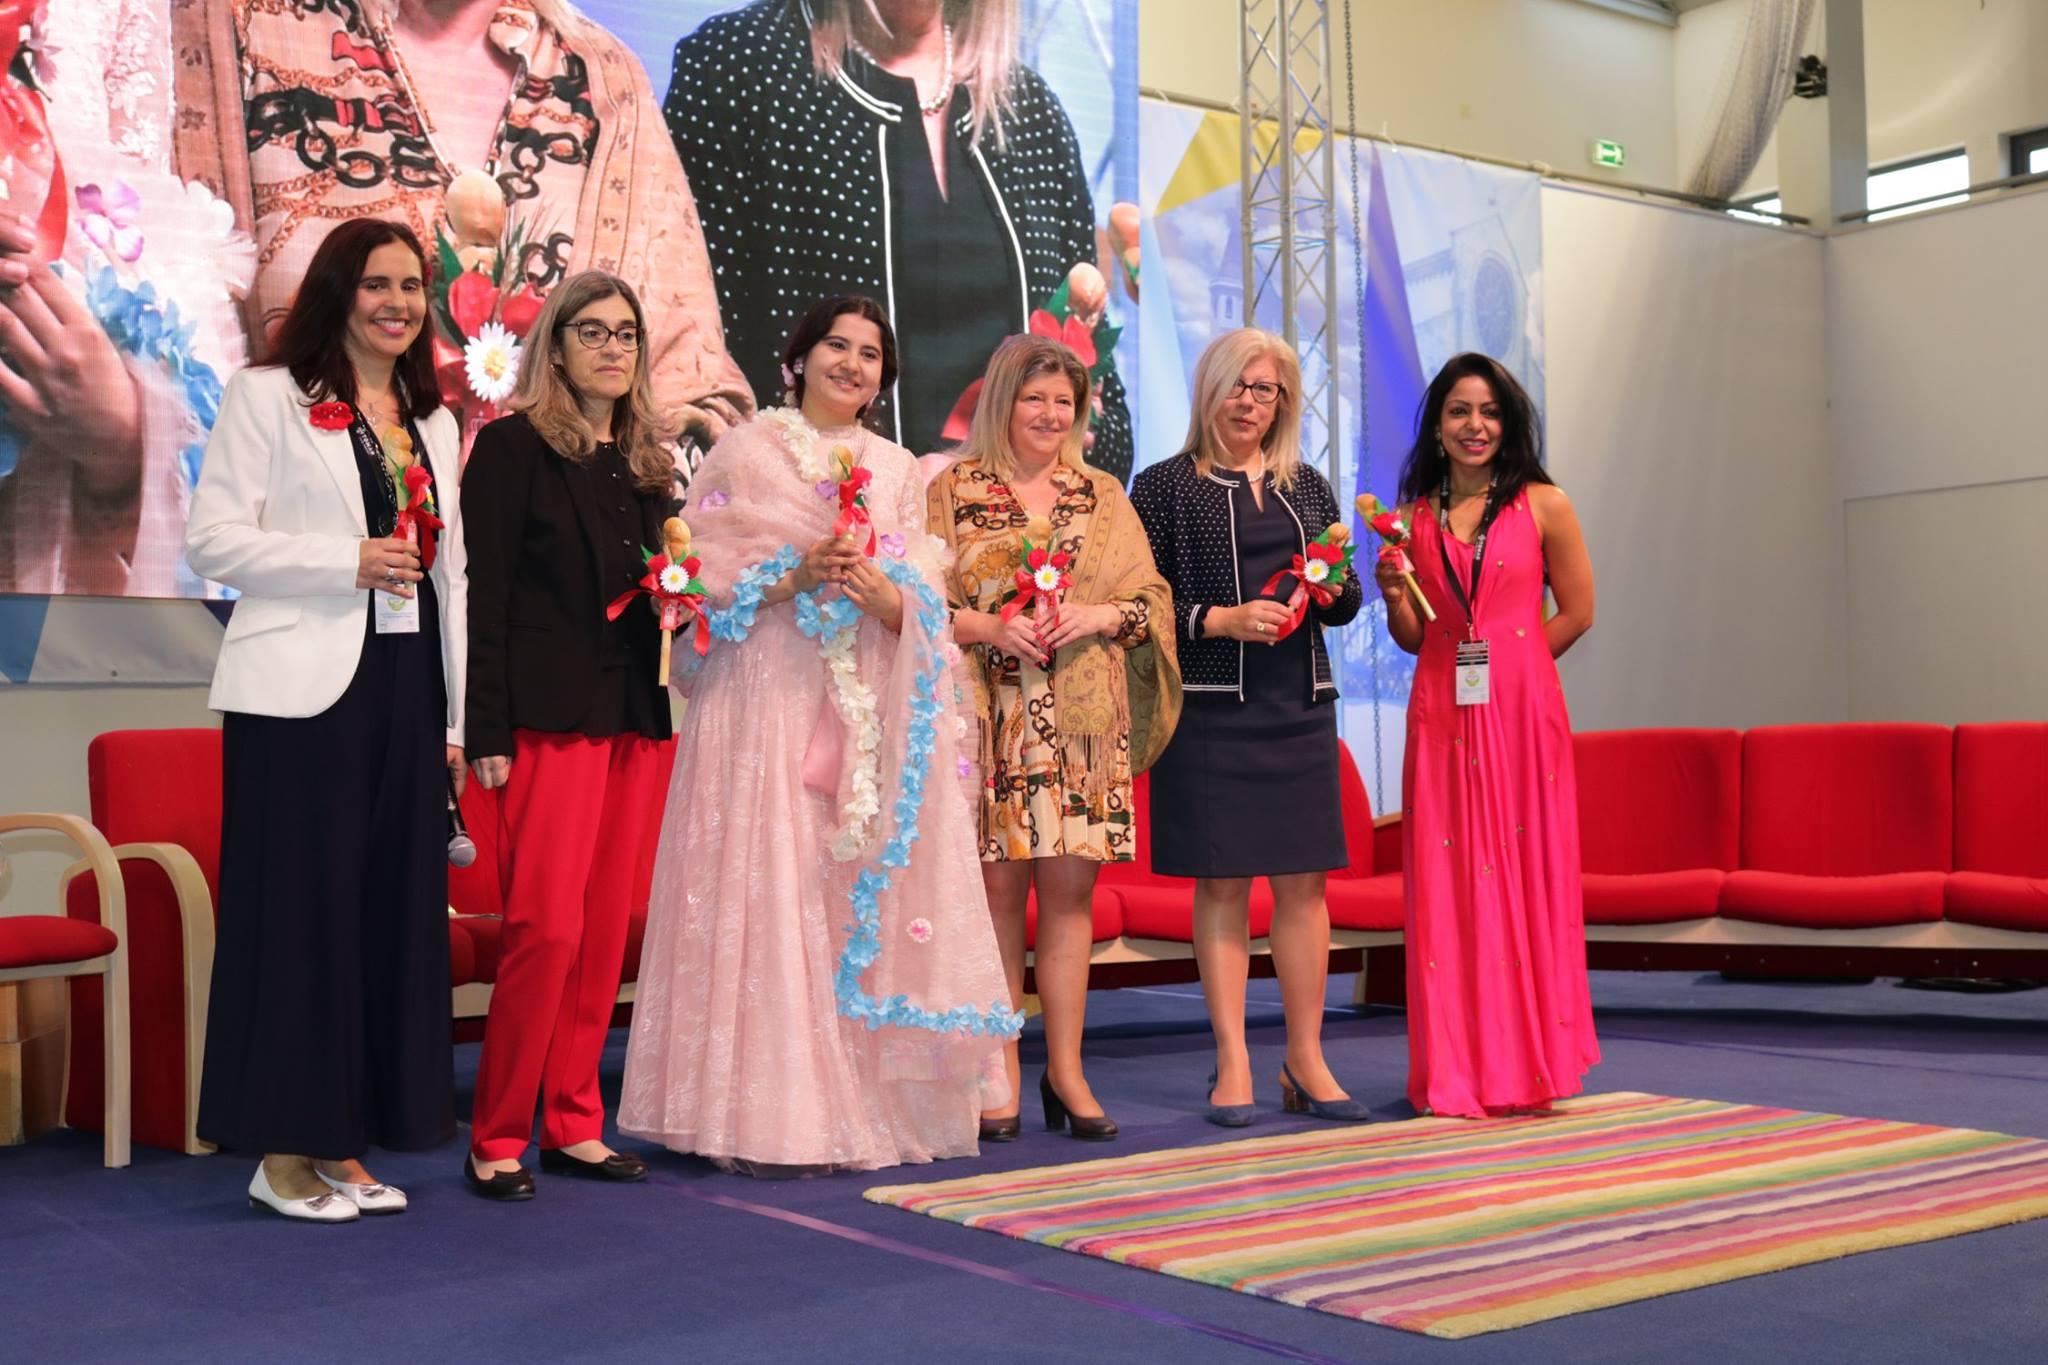 Conferência Internacional Women Economic Forum em Tomar